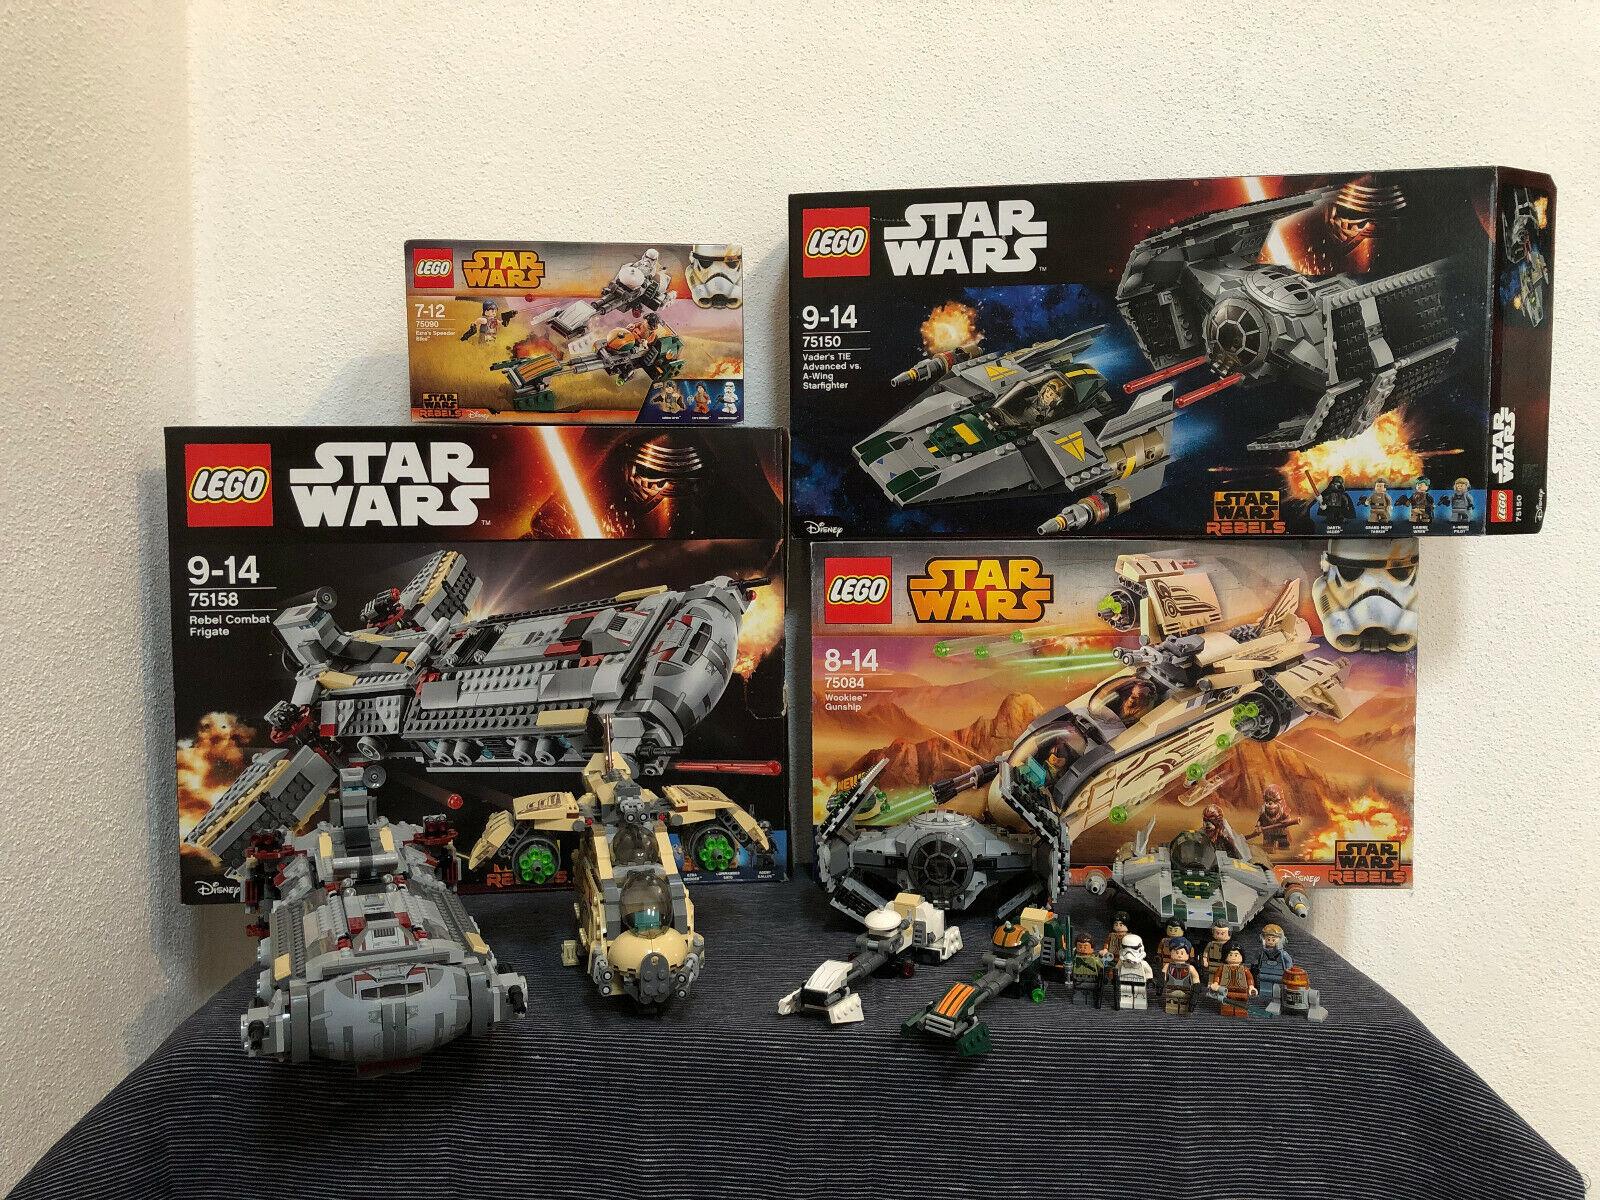 Lego Stern Wars Rebels Konvolut (75090, 75158, 75150, 75084) Beschreibung lesen